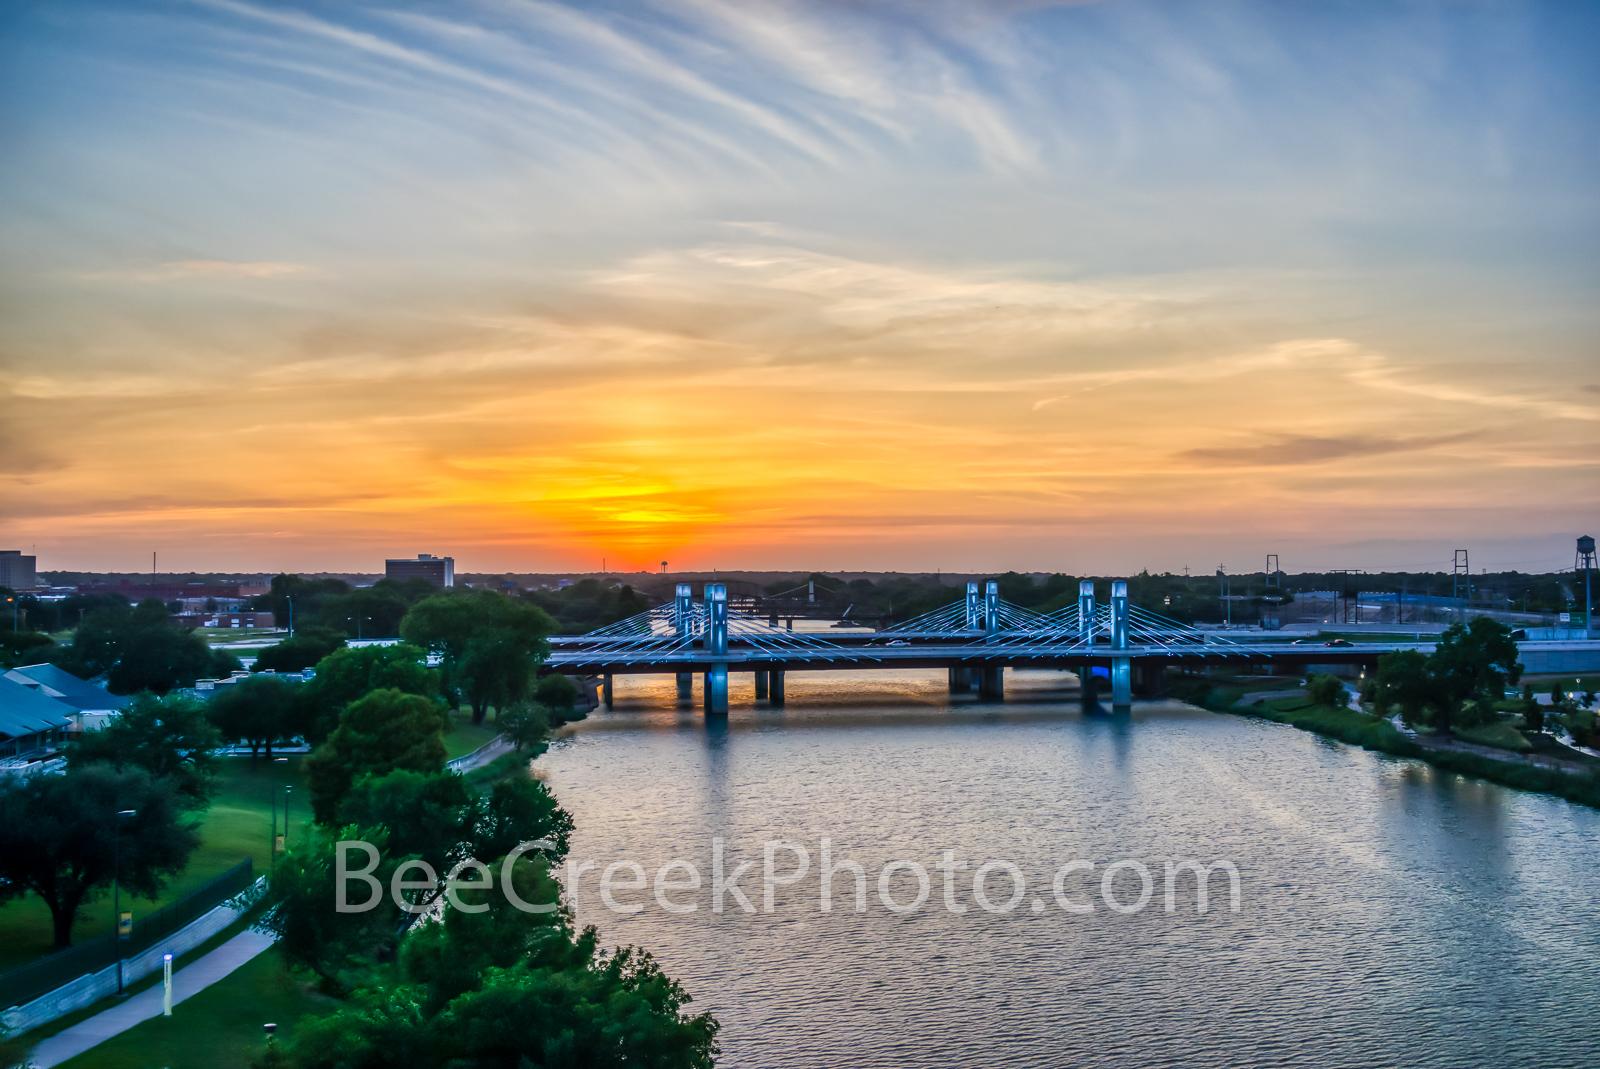 Waco, Brazos River bridge, sunset, aerial, downtown, IH35 stay bridge, colorful led, texas, Jack Kultgen Freeway,, photo